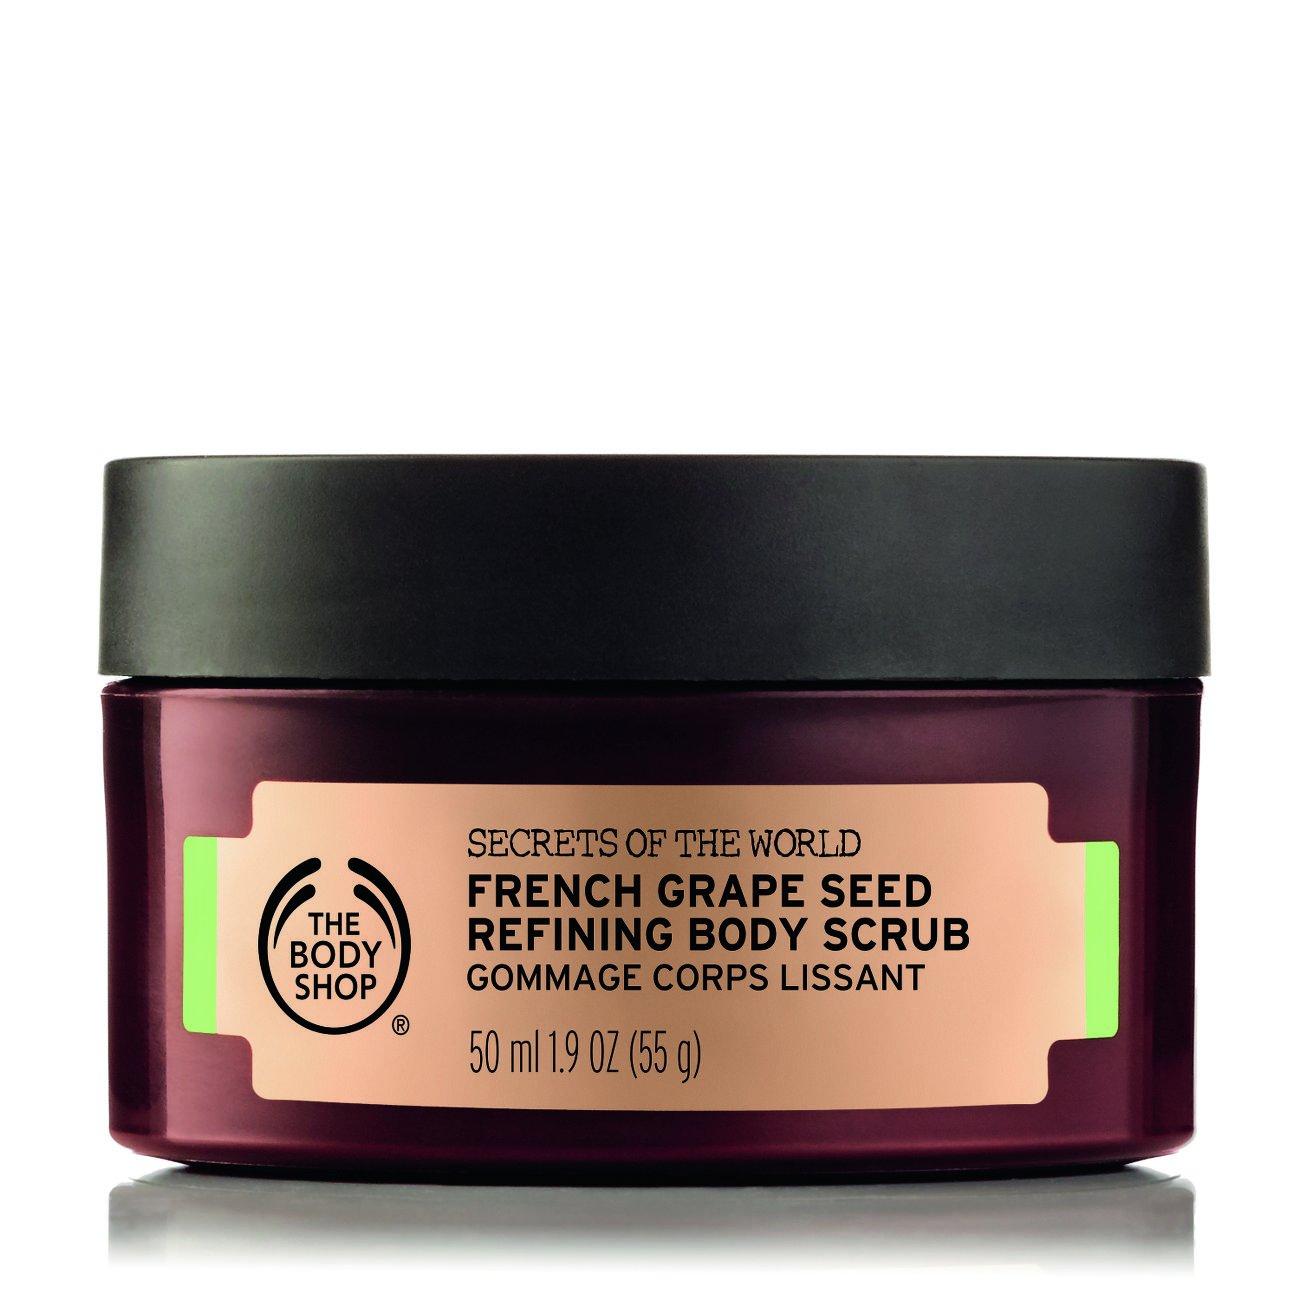 The Body Shop - French Grape Seed Refining Body Scrub (50ml)